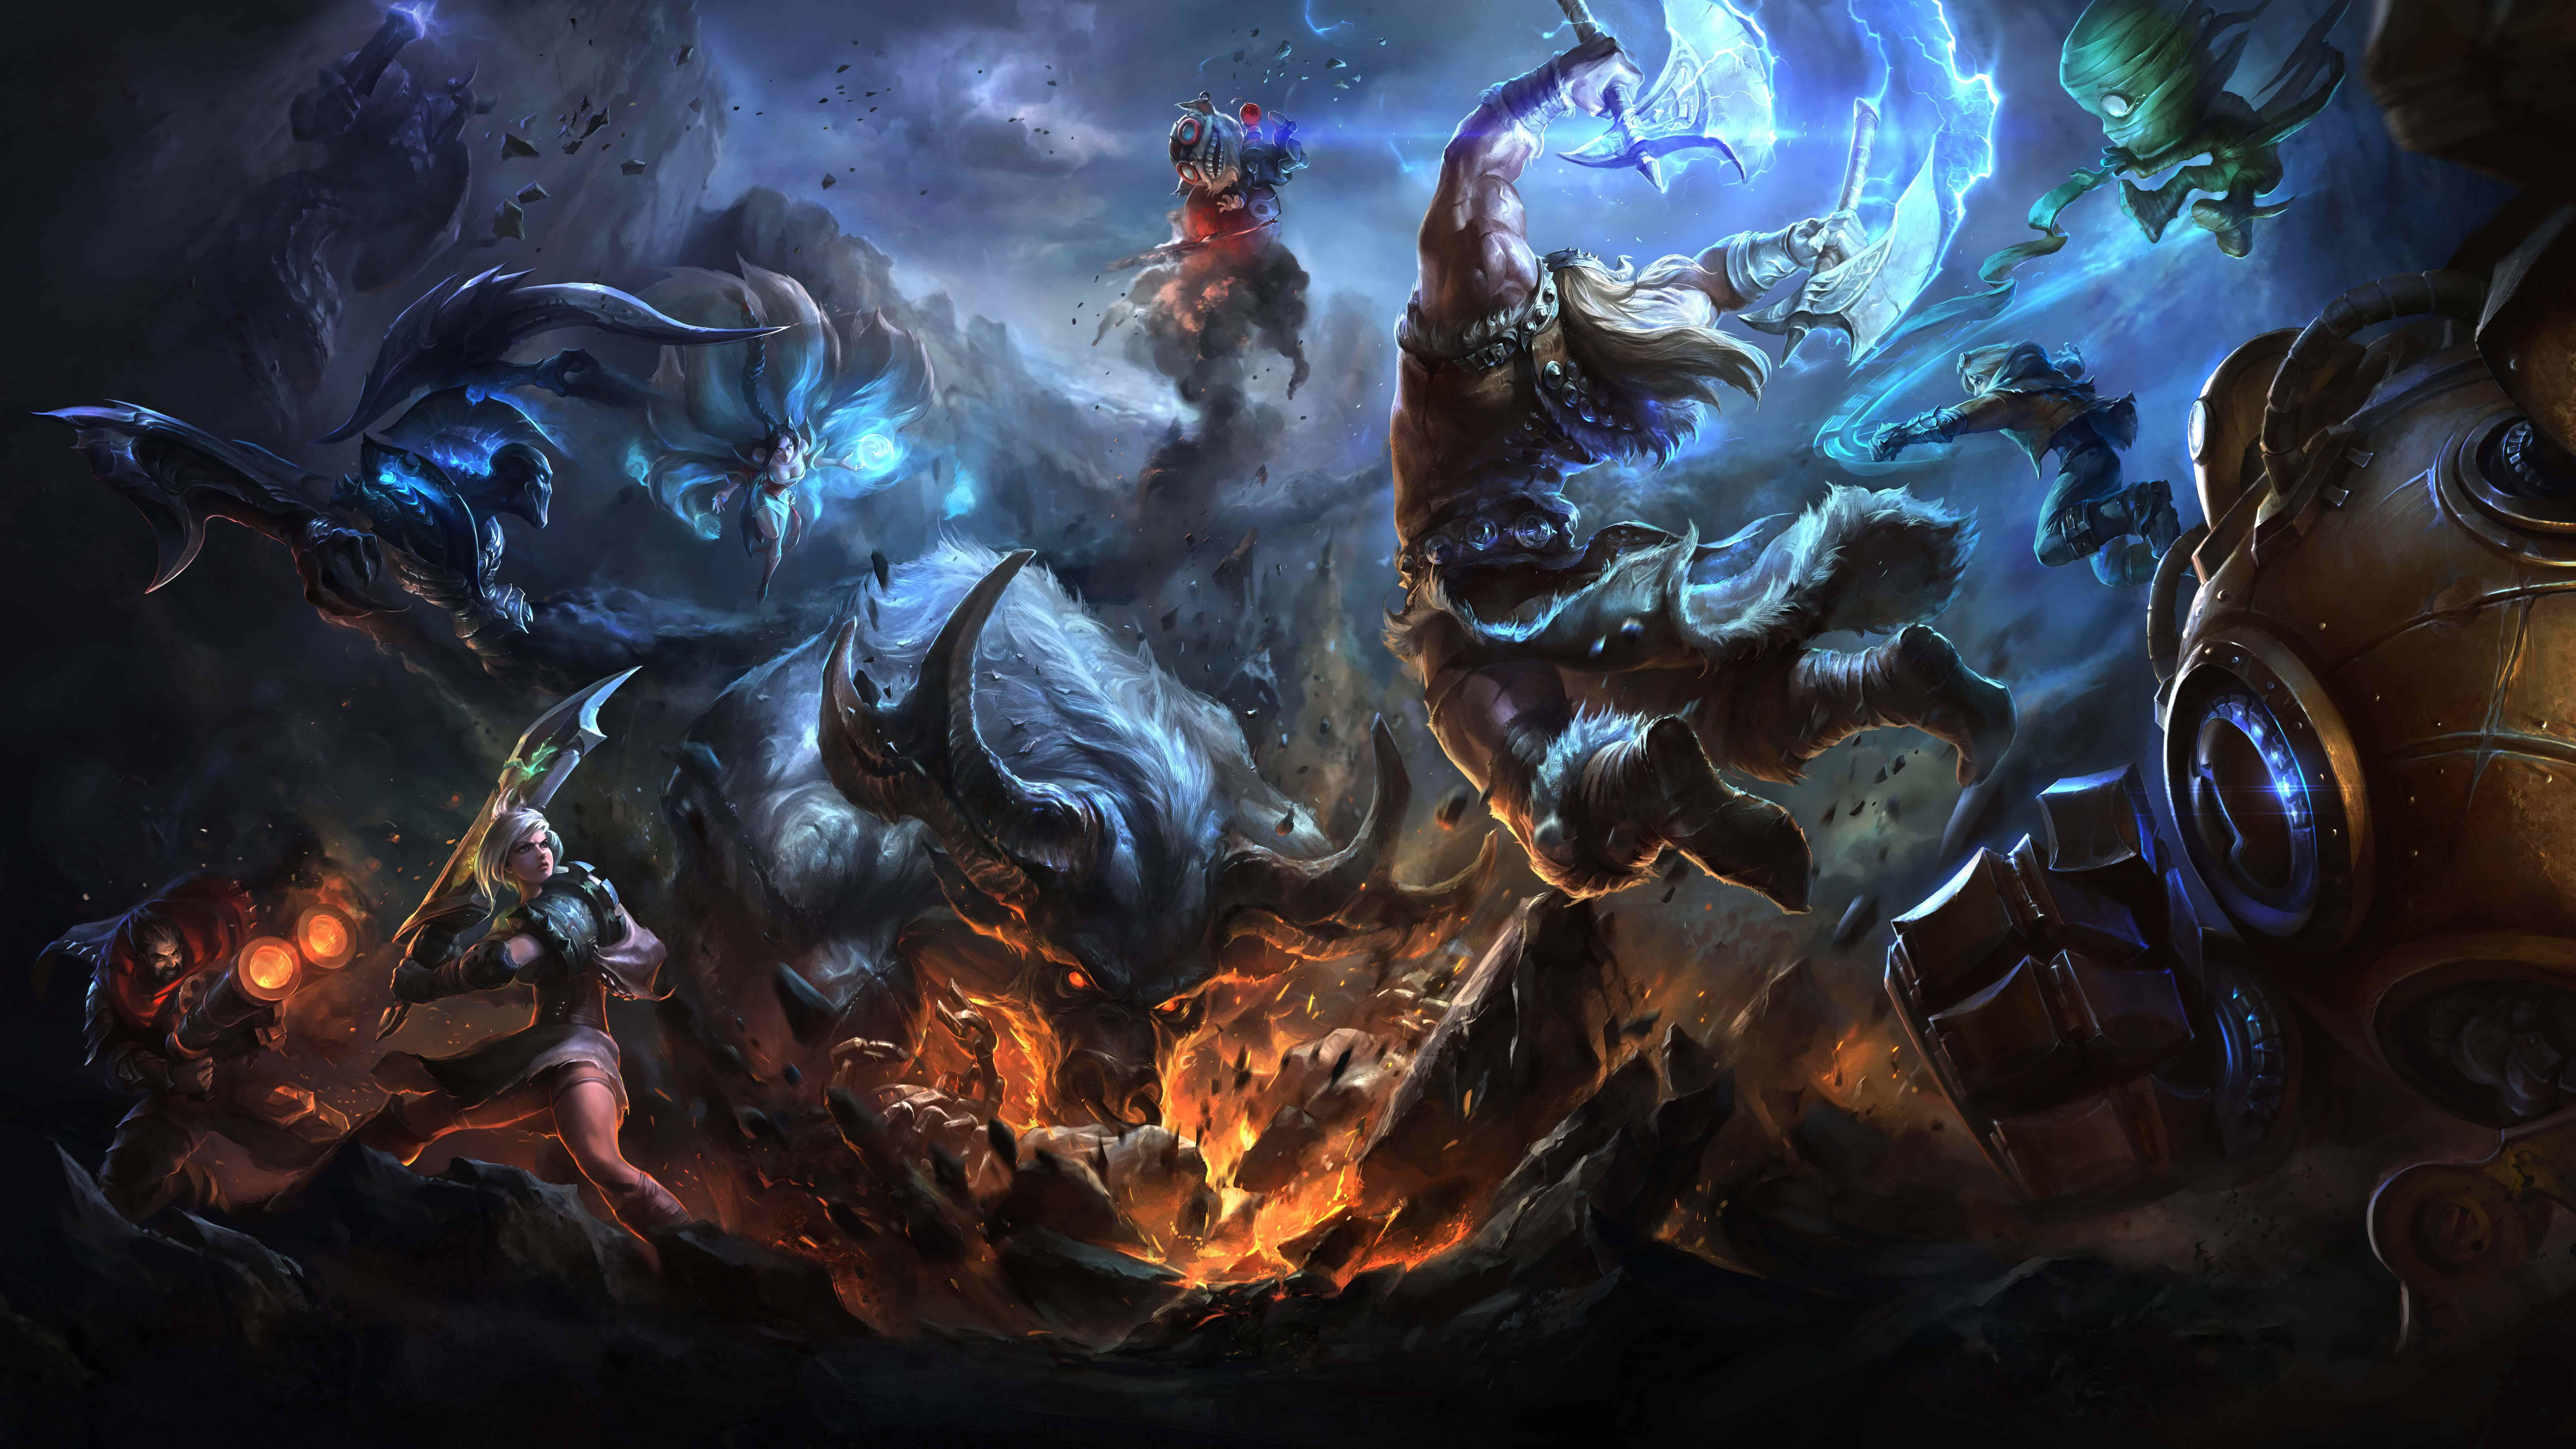 League Of Legends Olaf UHD 8K Wallpaper Pixelz 7680x4320